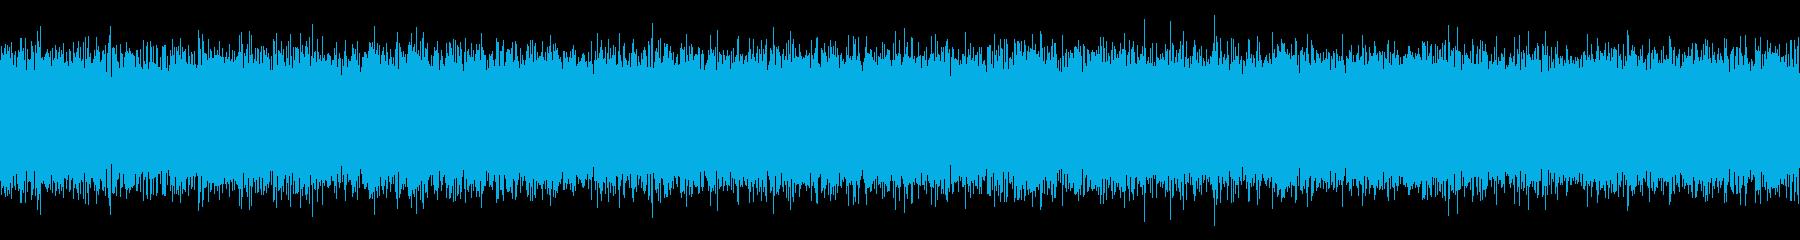 TVの砂嵐の音の再生済みの波形